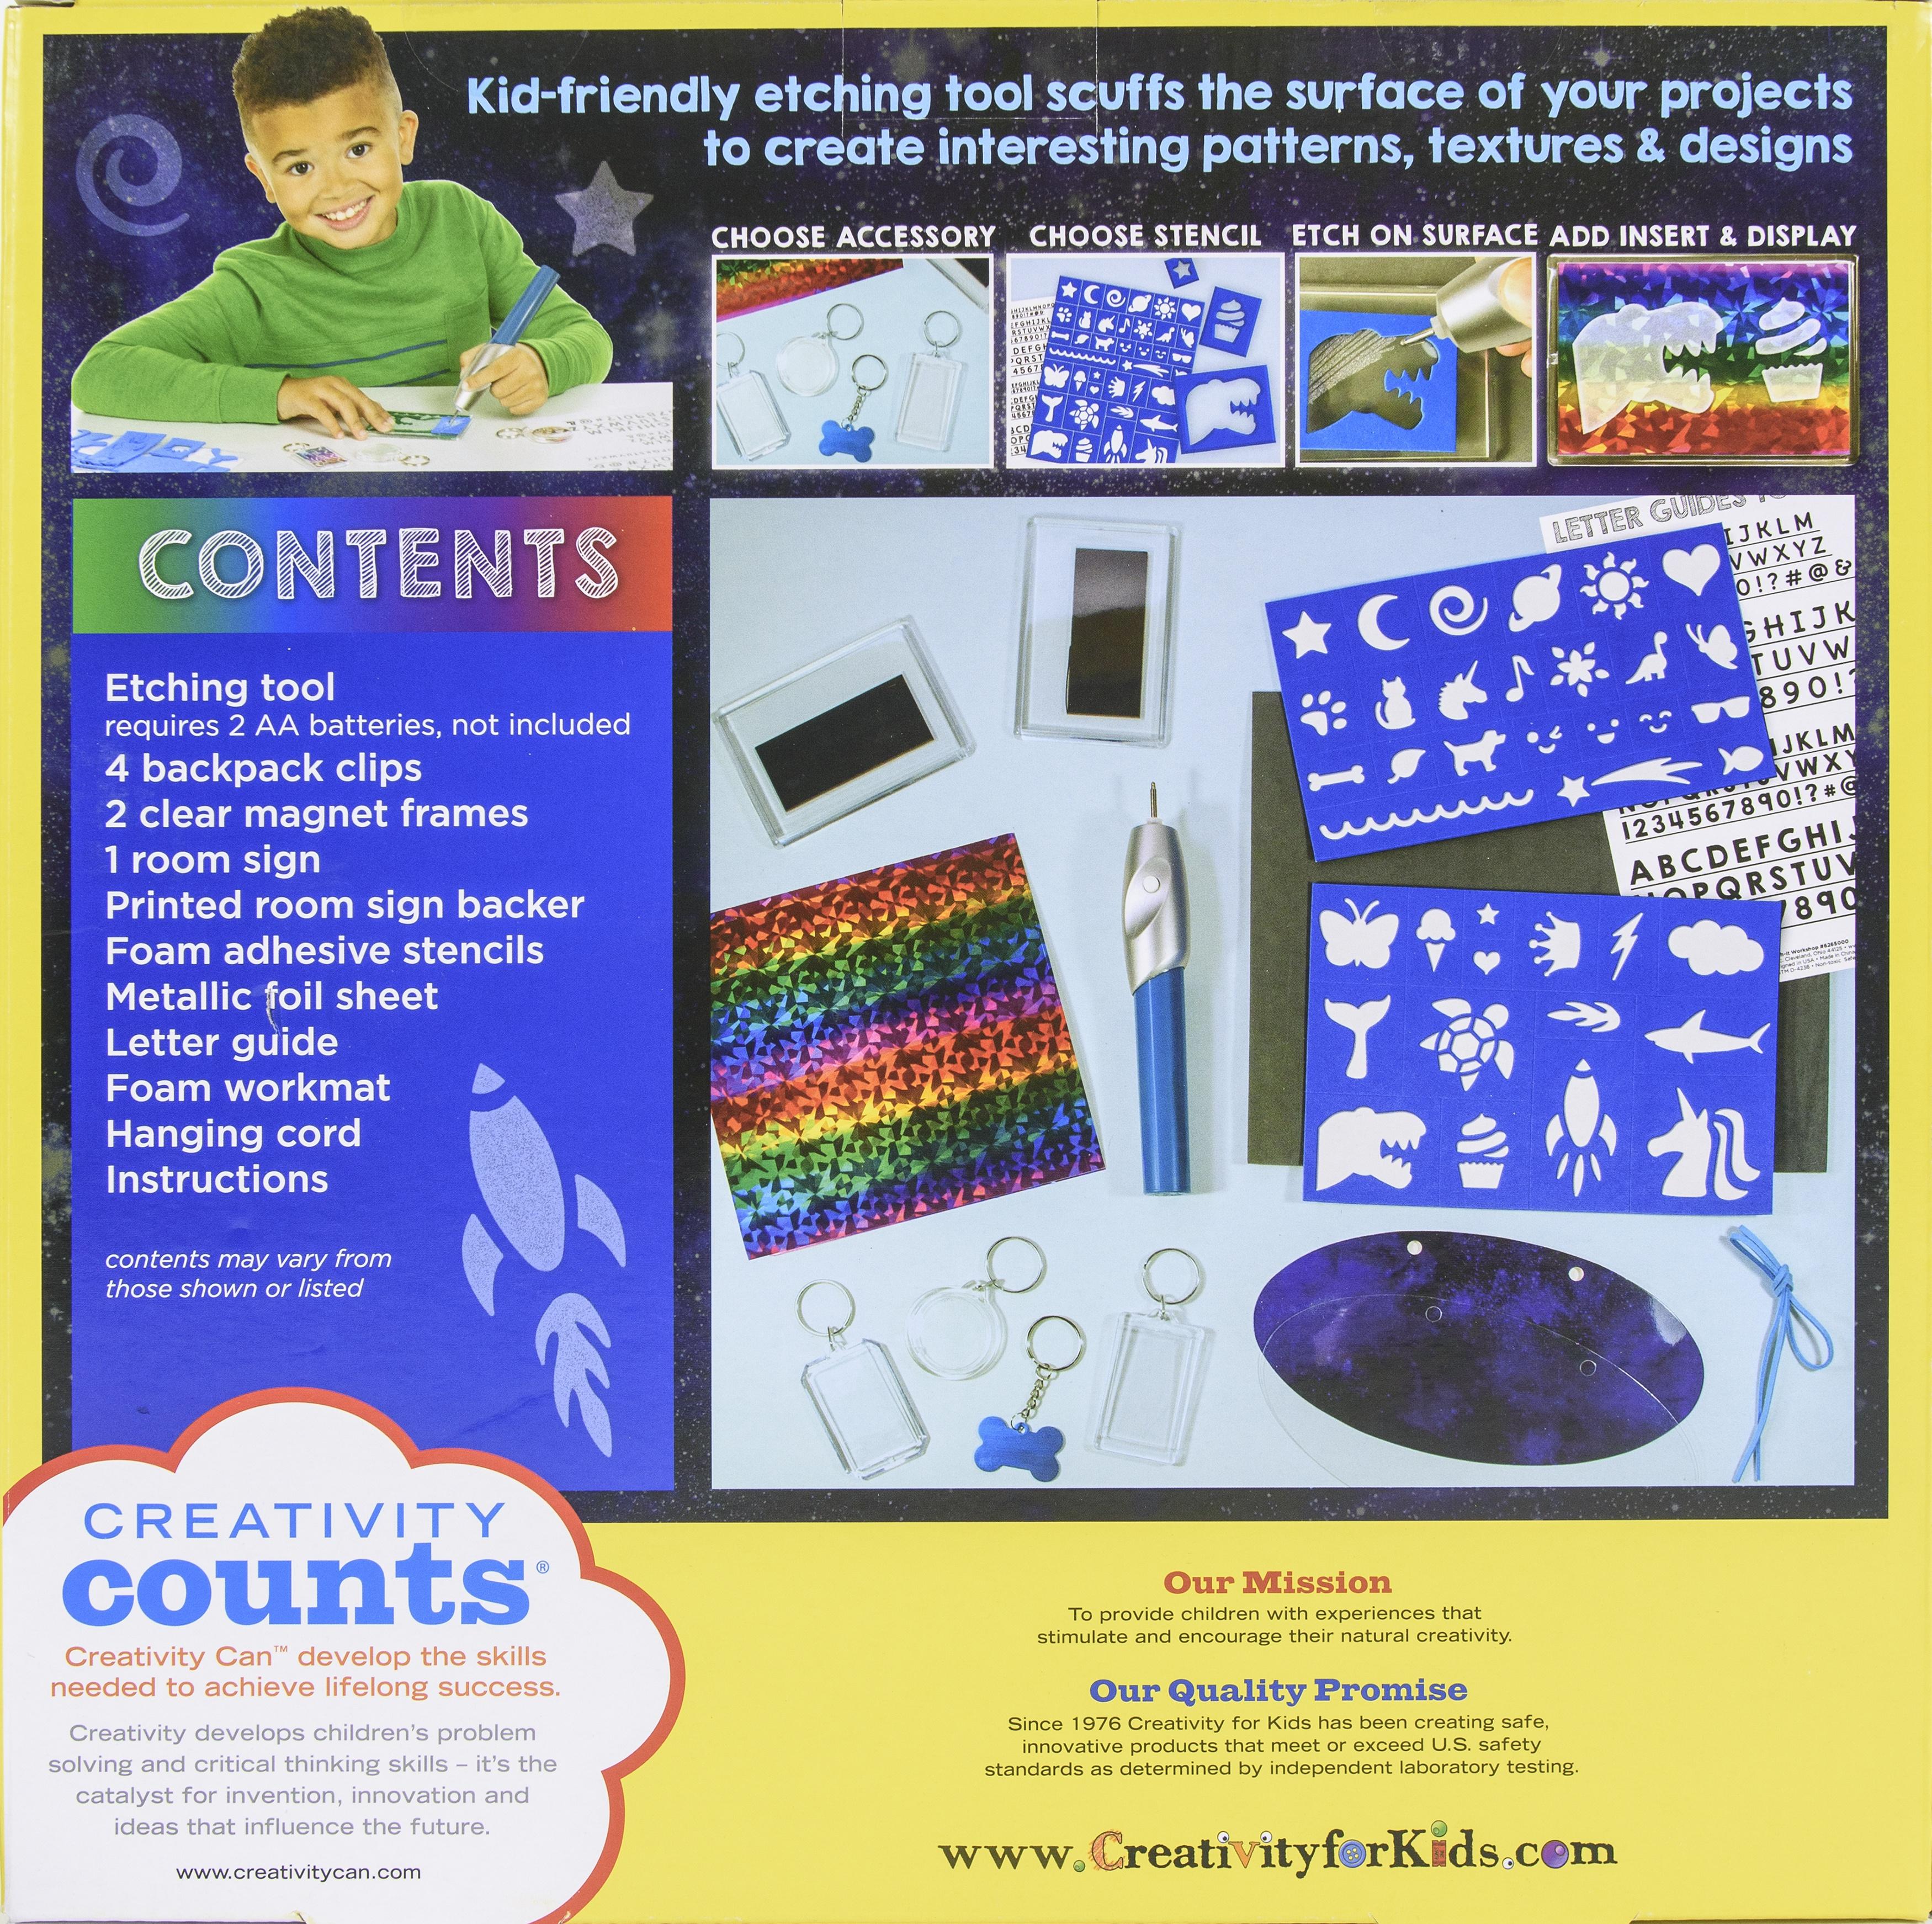 Creativity For Kids Etch-It Workshop-